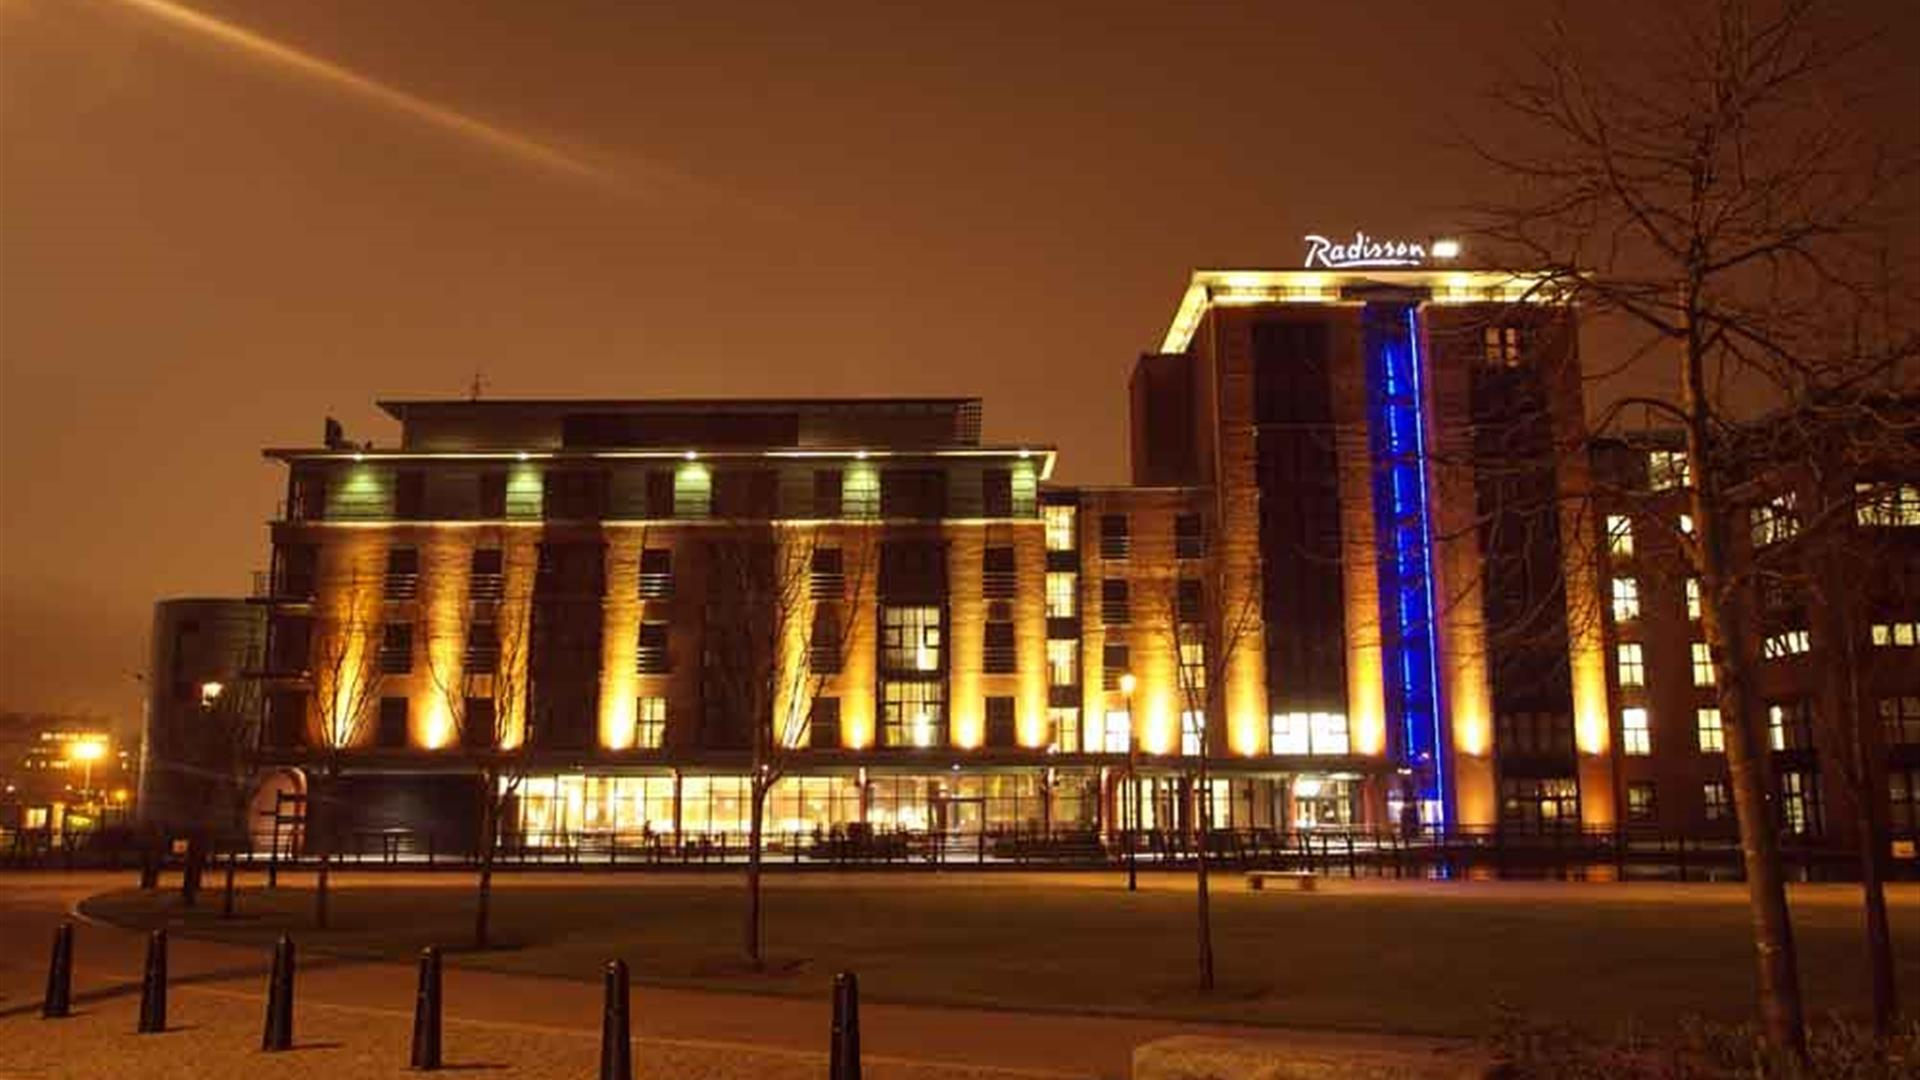 Radisson Blue Belfast Hotel